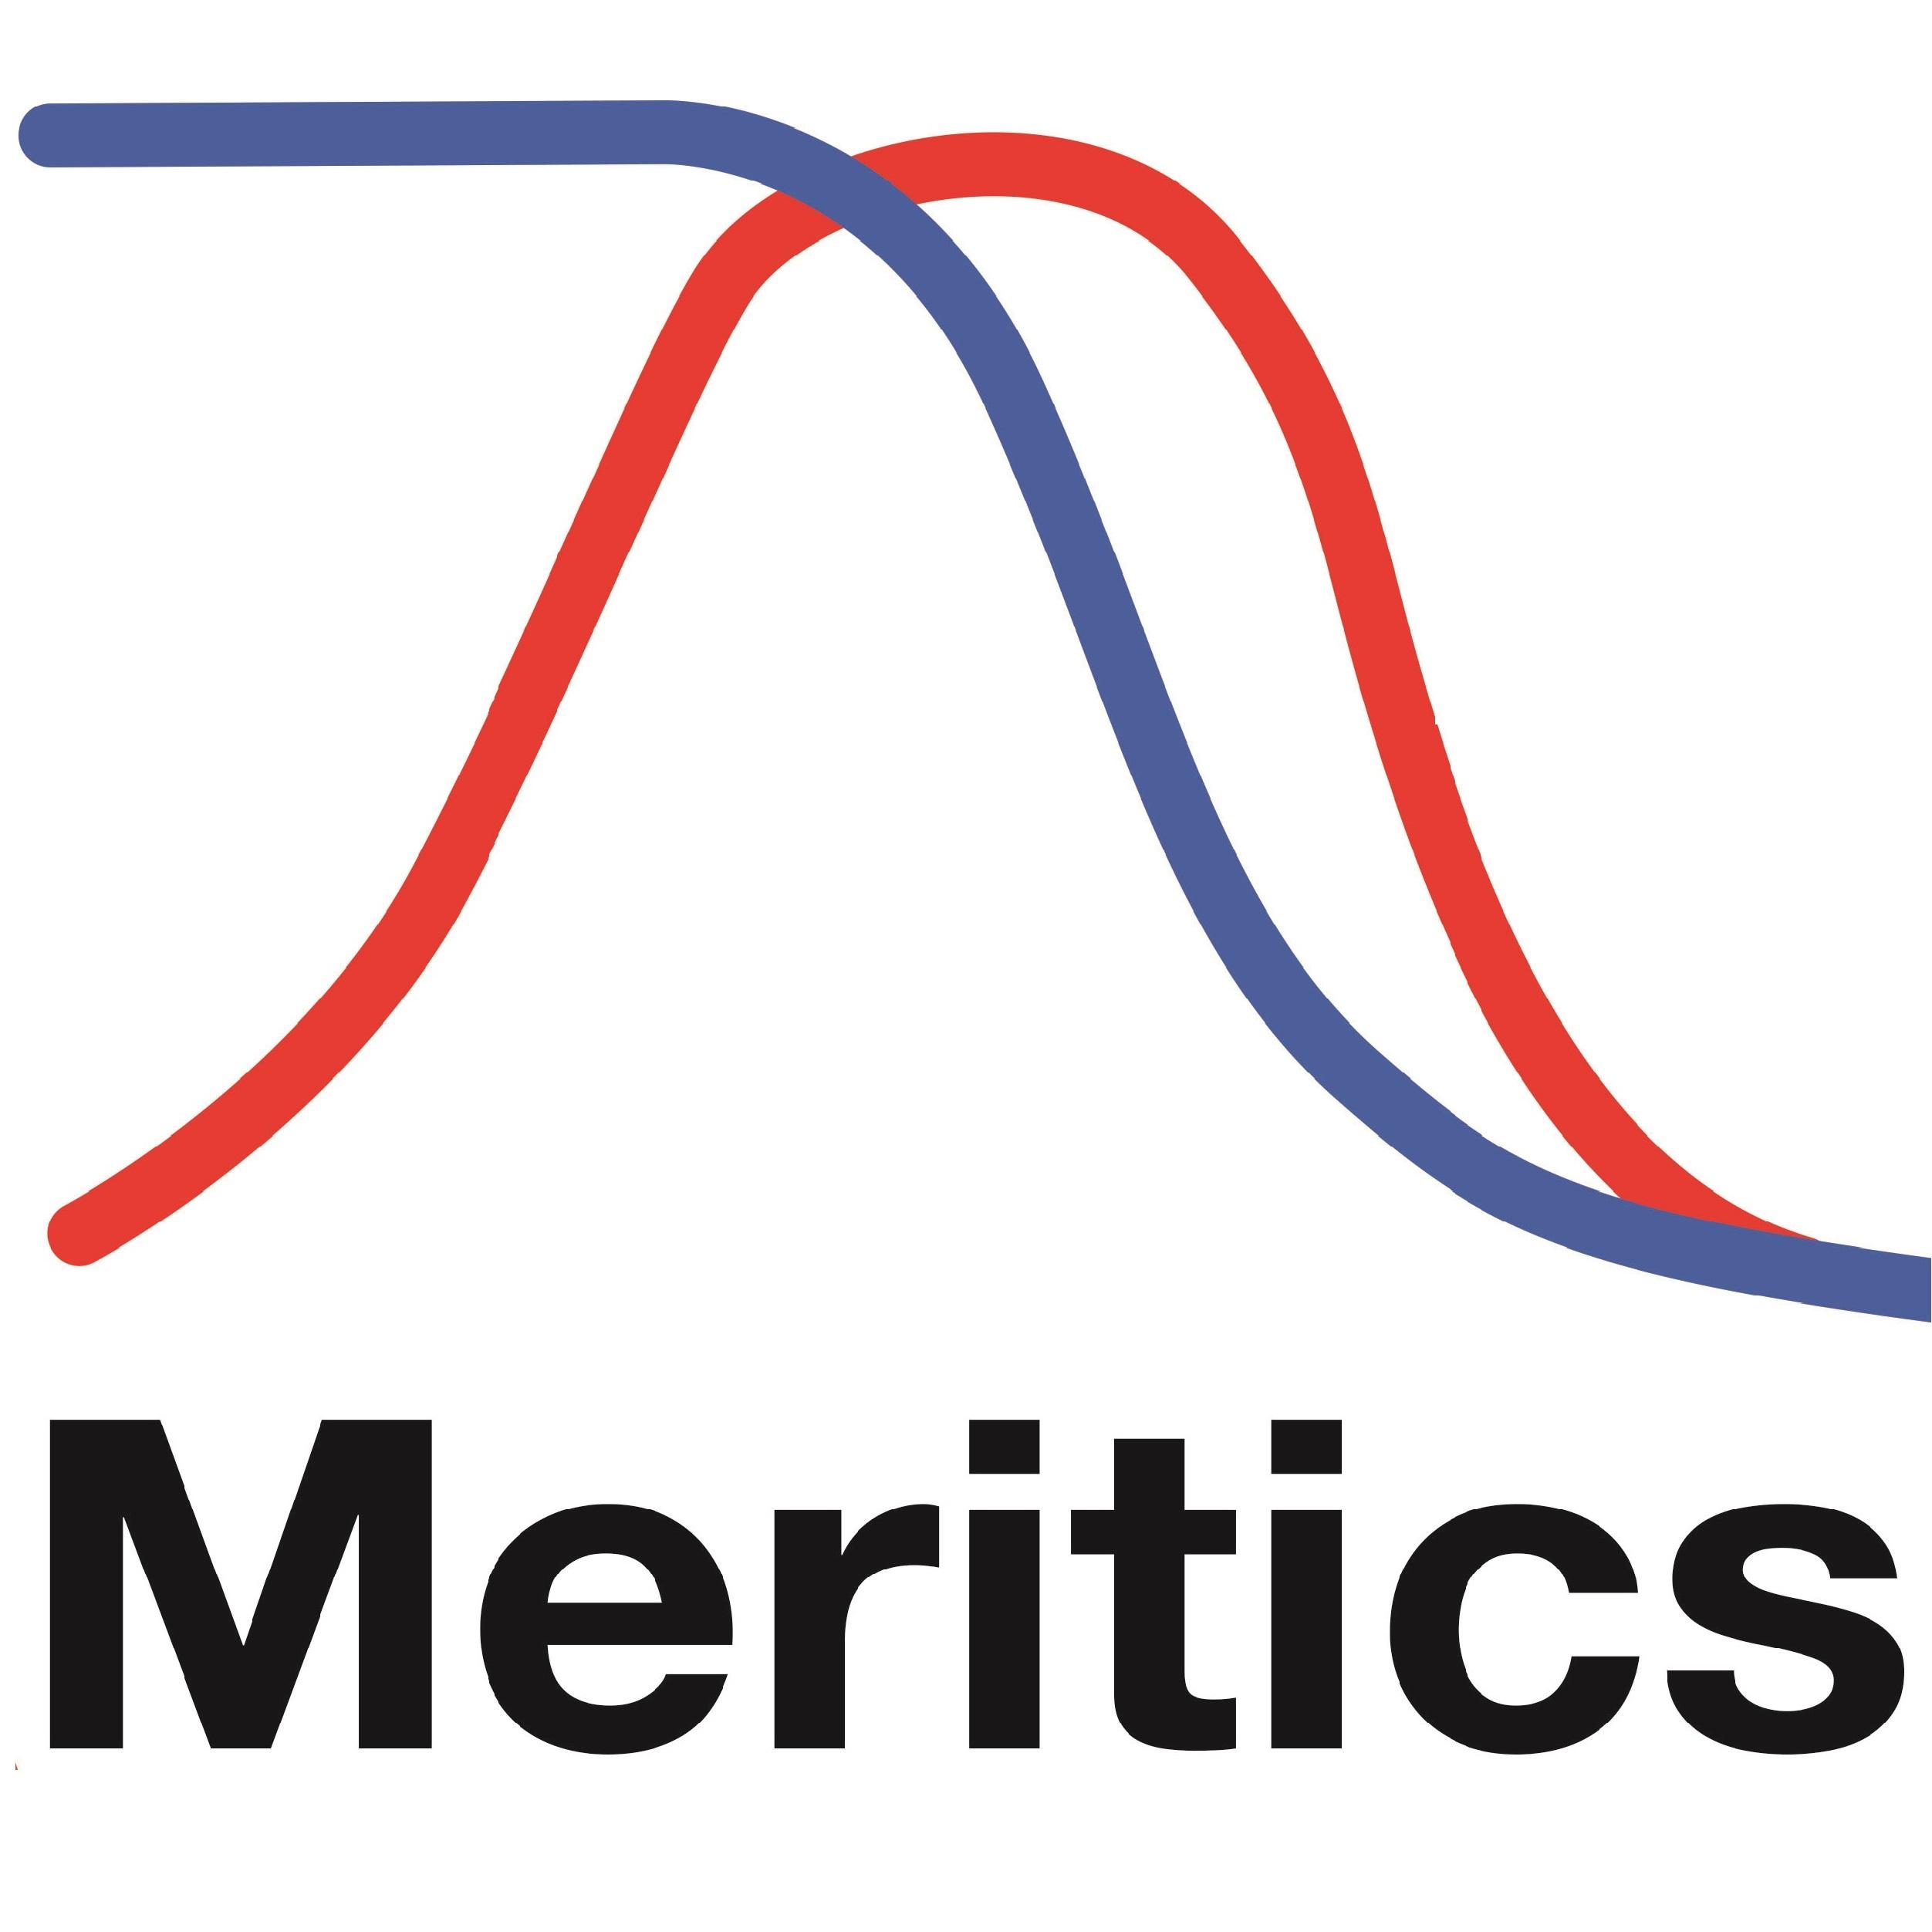 Meritics Limited